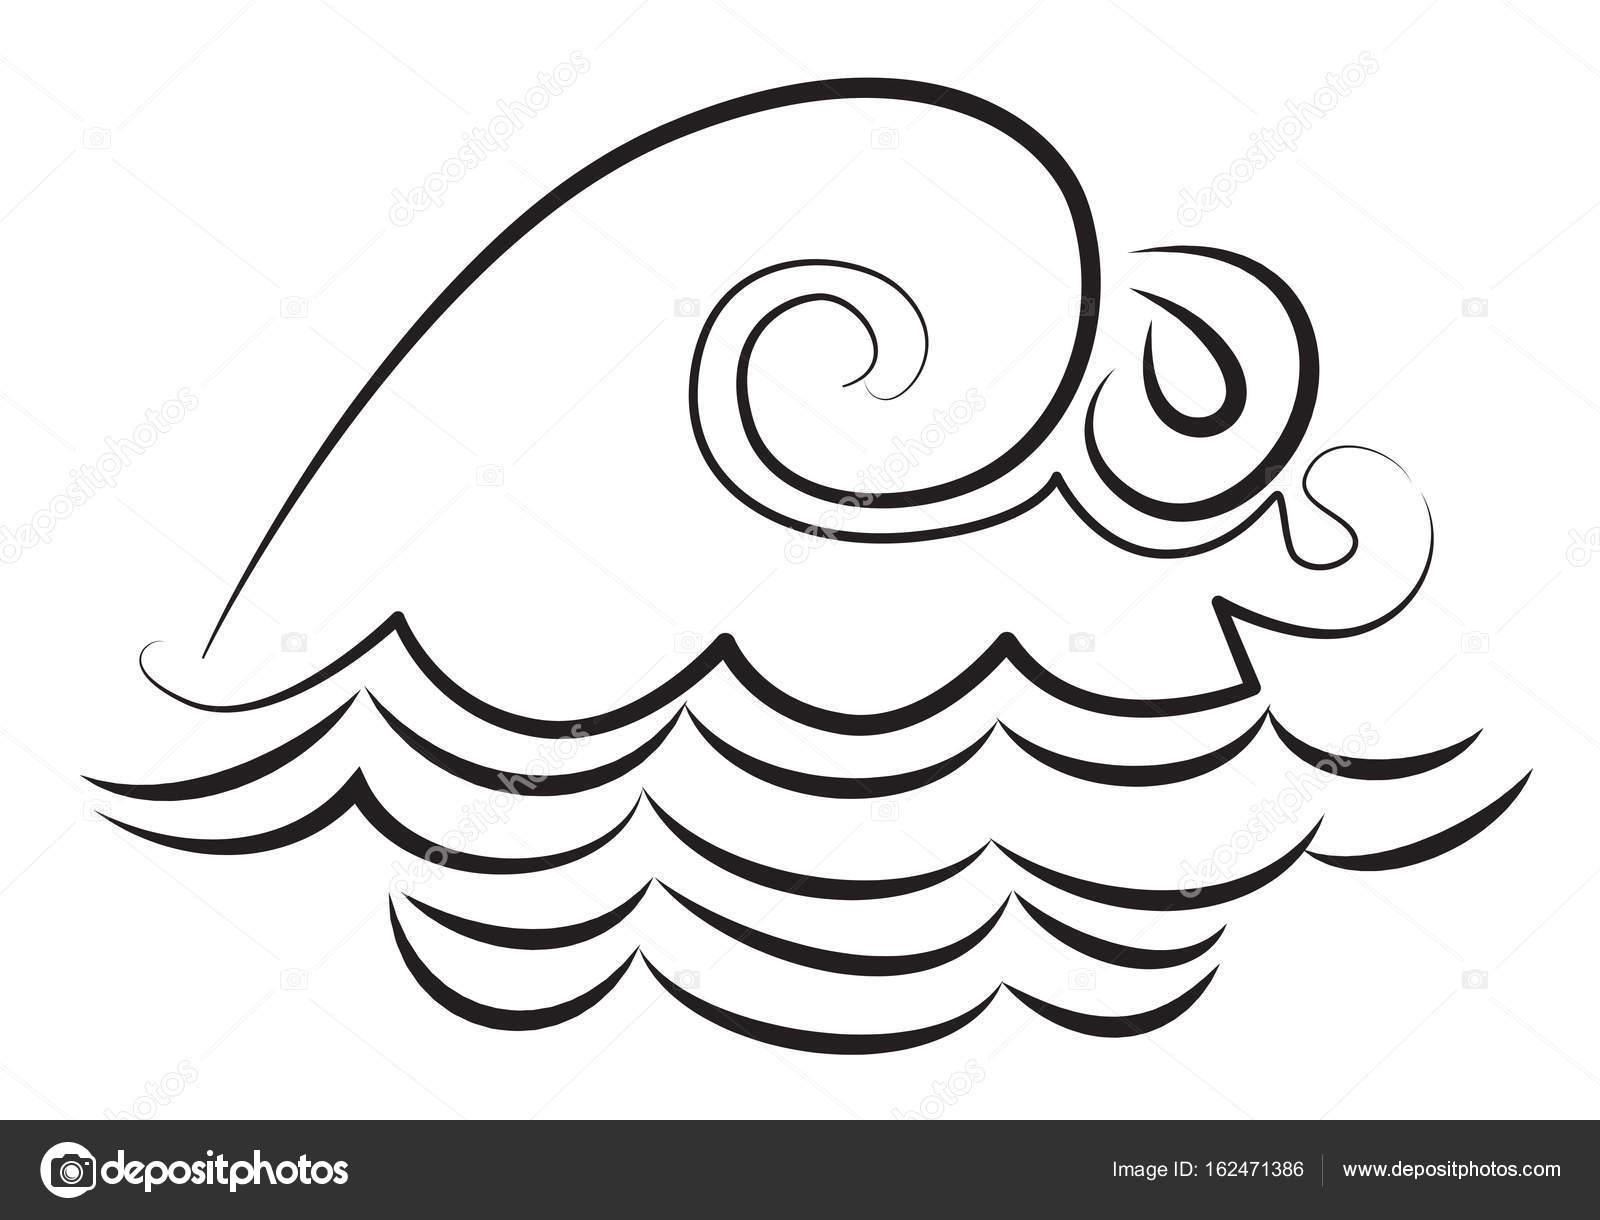 1600x1220 Cartoon Image Of Wave Icon. Water Wave Symbol Stock Vector